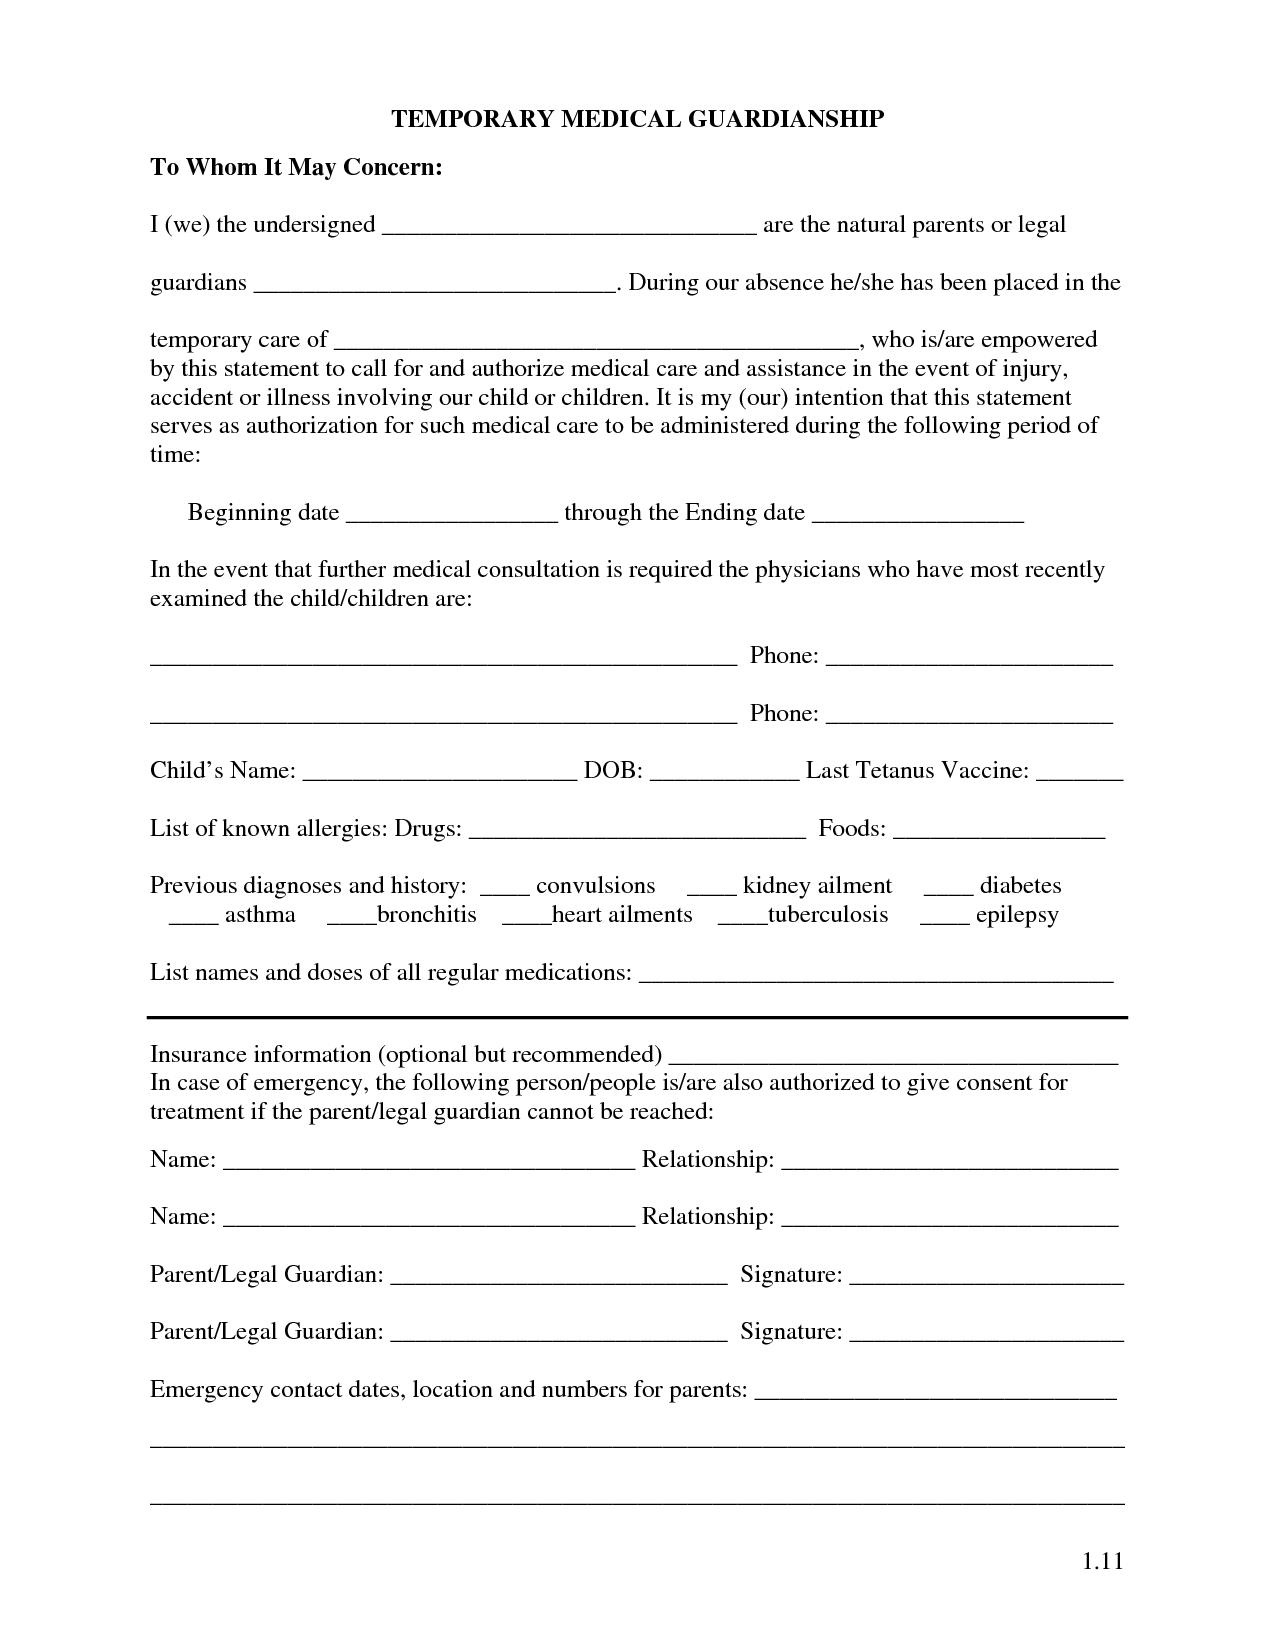 Free Printable Temporary Guardianship Forms | Forms | Child Custody - Free Printable Guardianship Forms